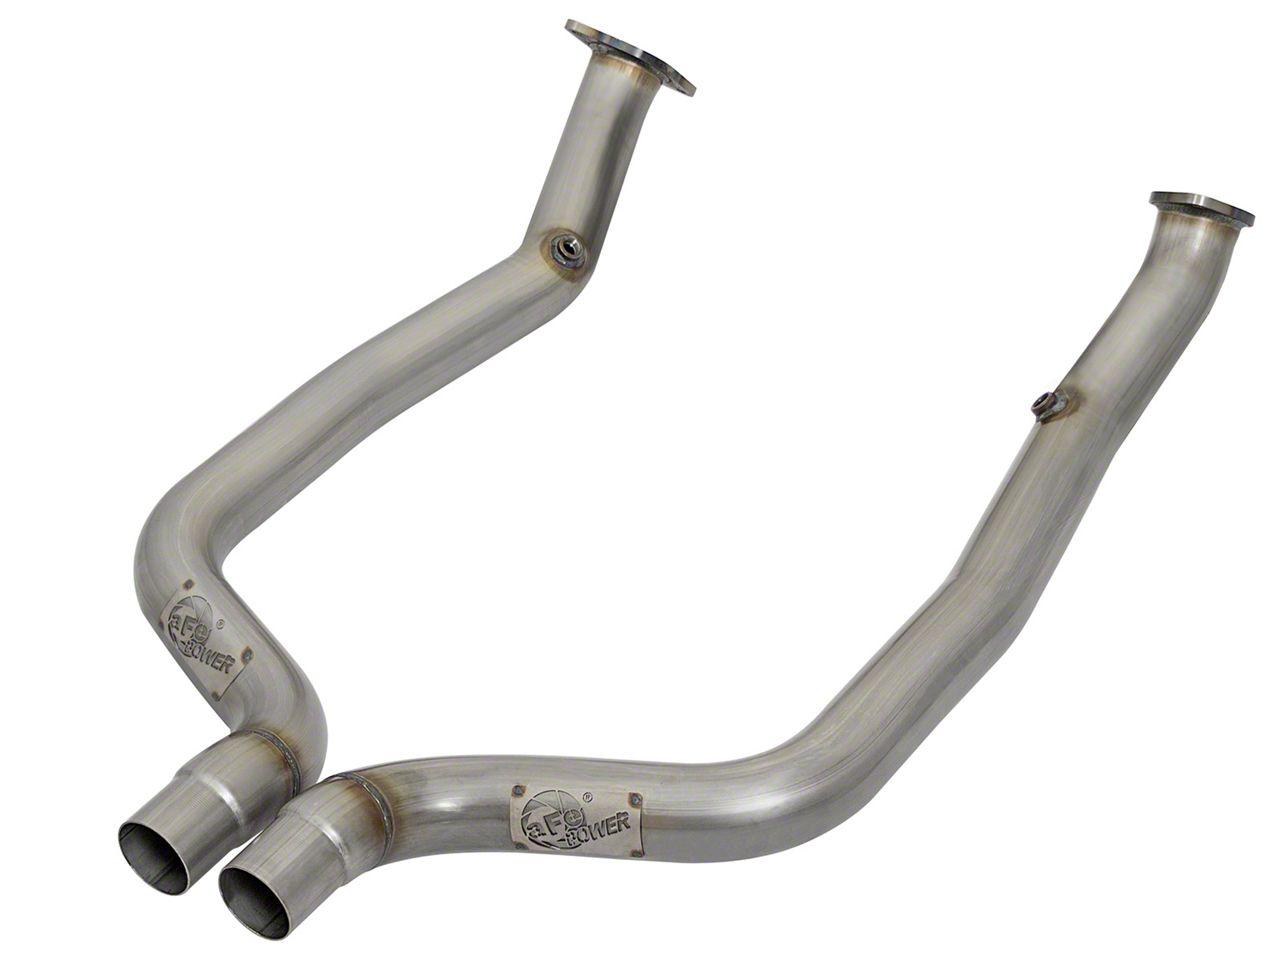 AFE 3 in. Twisted Steel Off-Road Mid-Pipe - Race Series (15-18 6.2L HEMI, 6.4L HEMI)